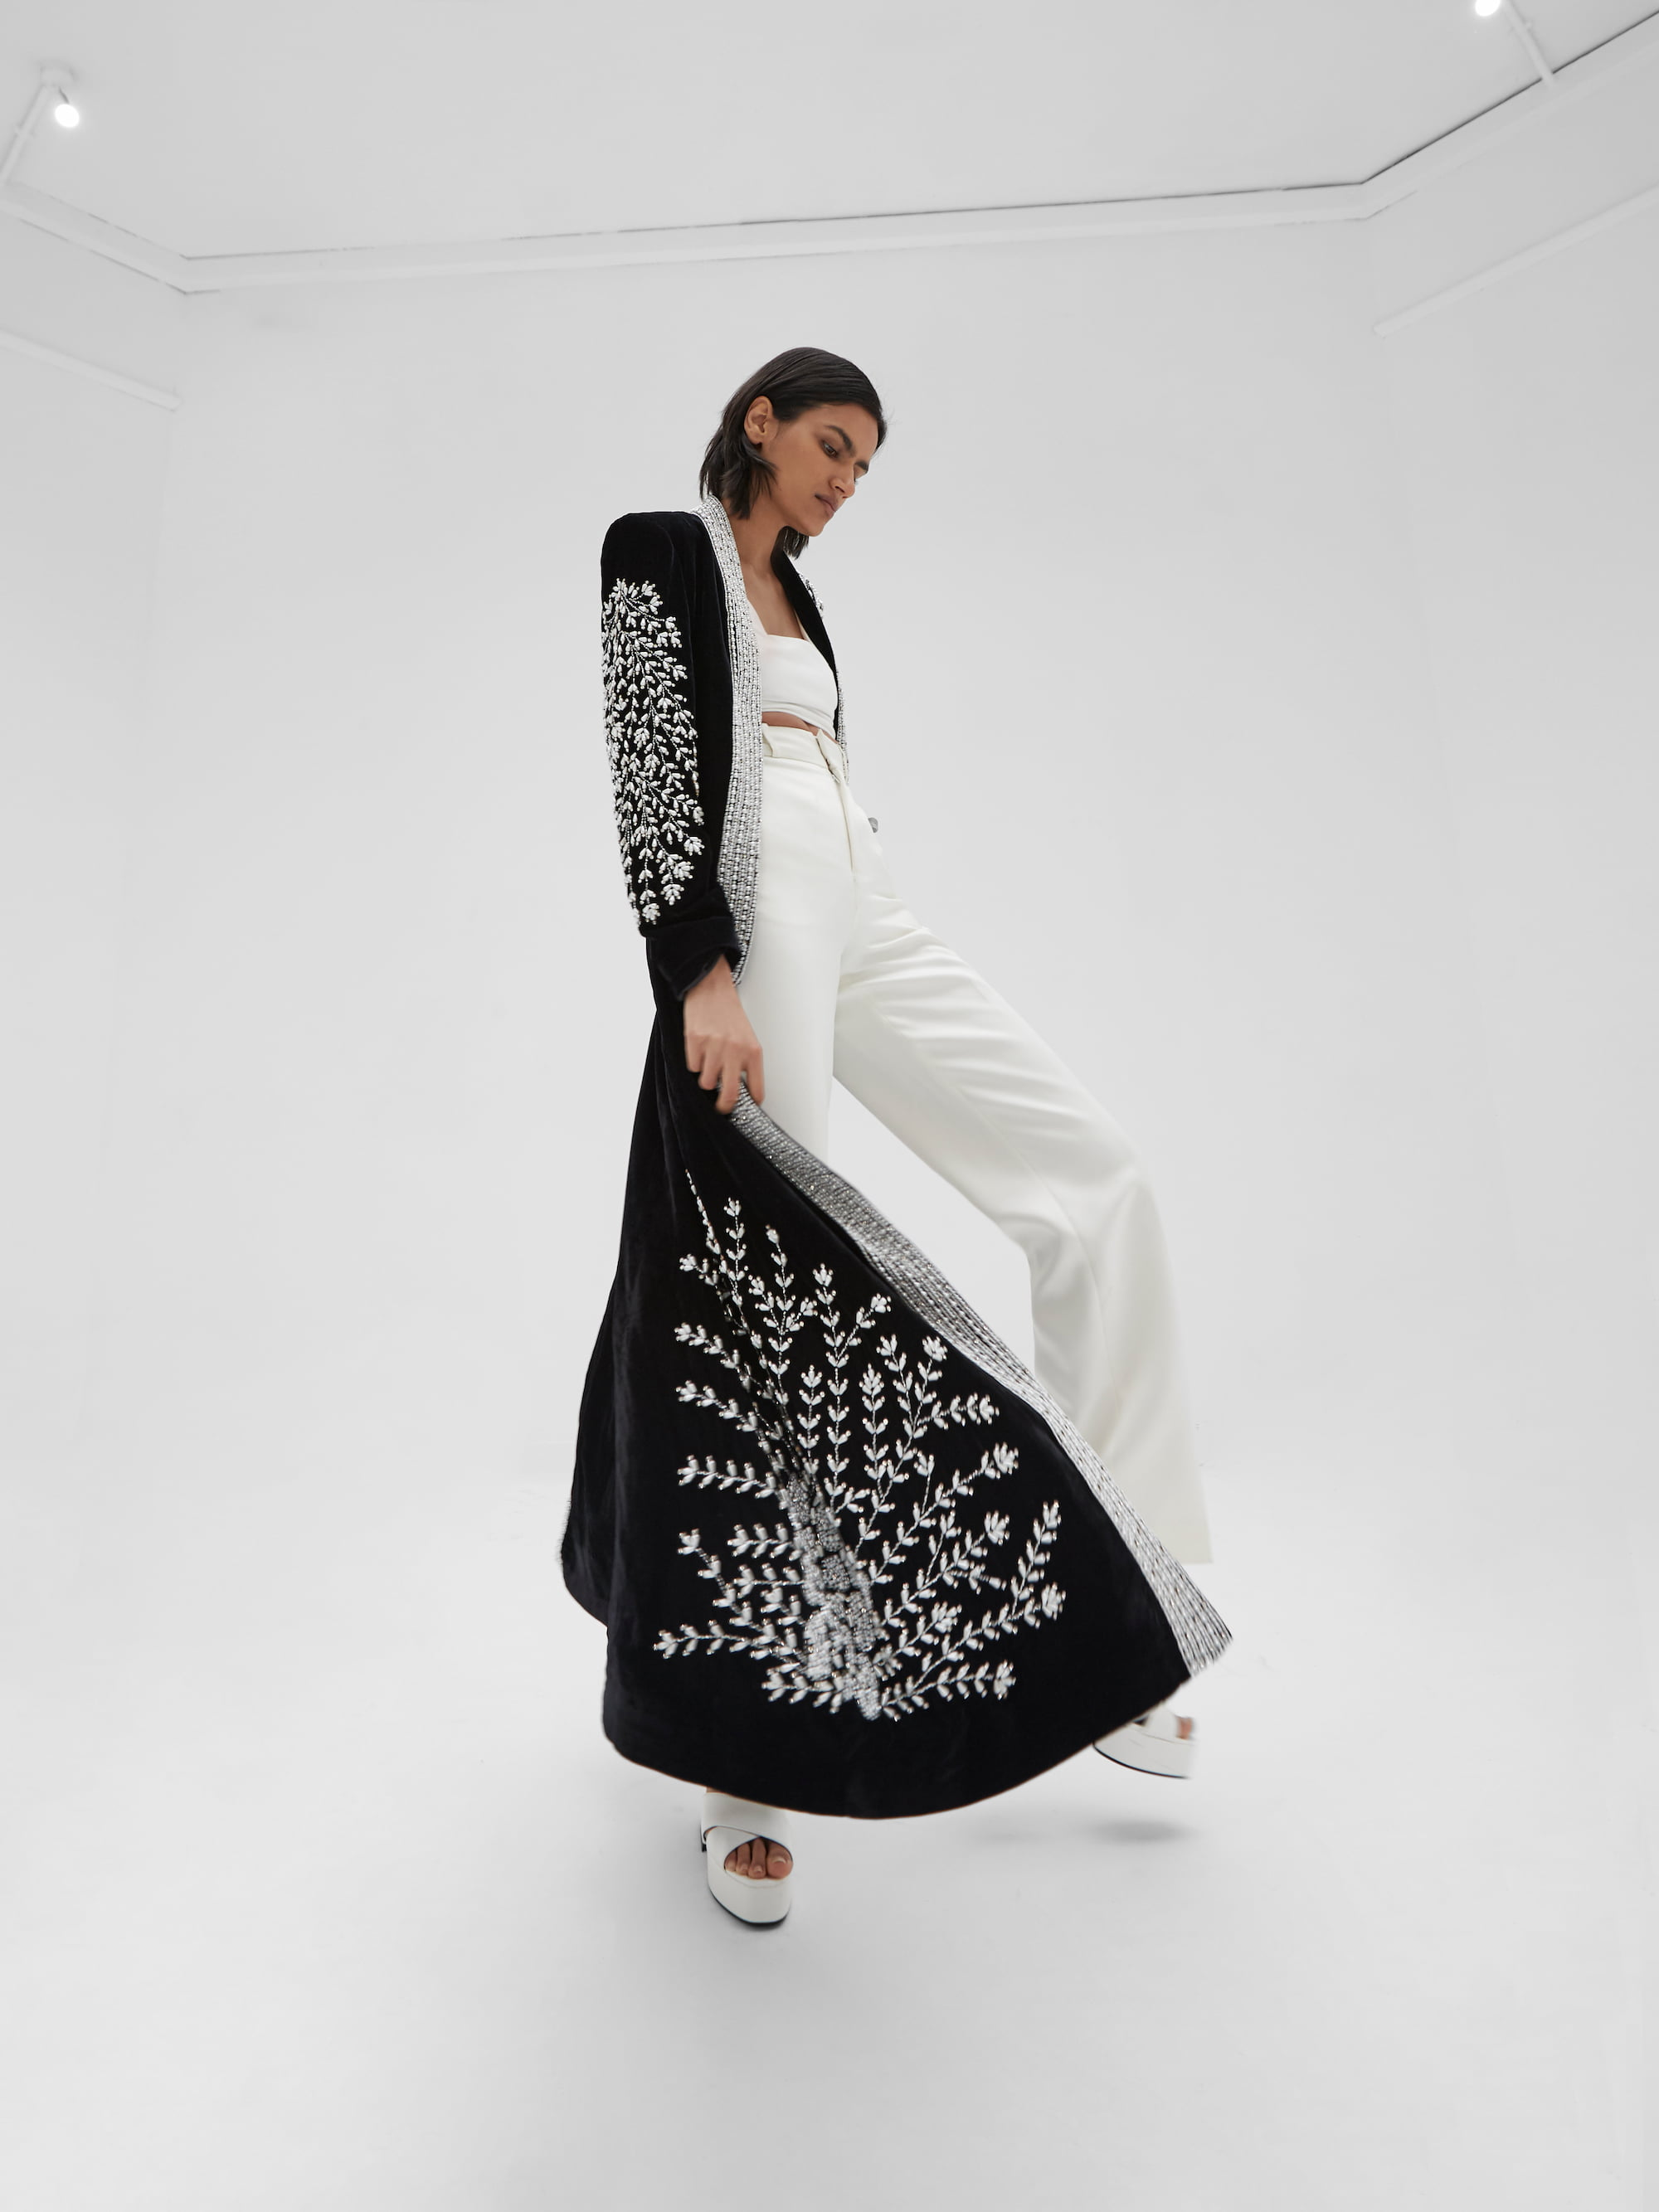 View 4 of model wearing Kamia Kimono in black.